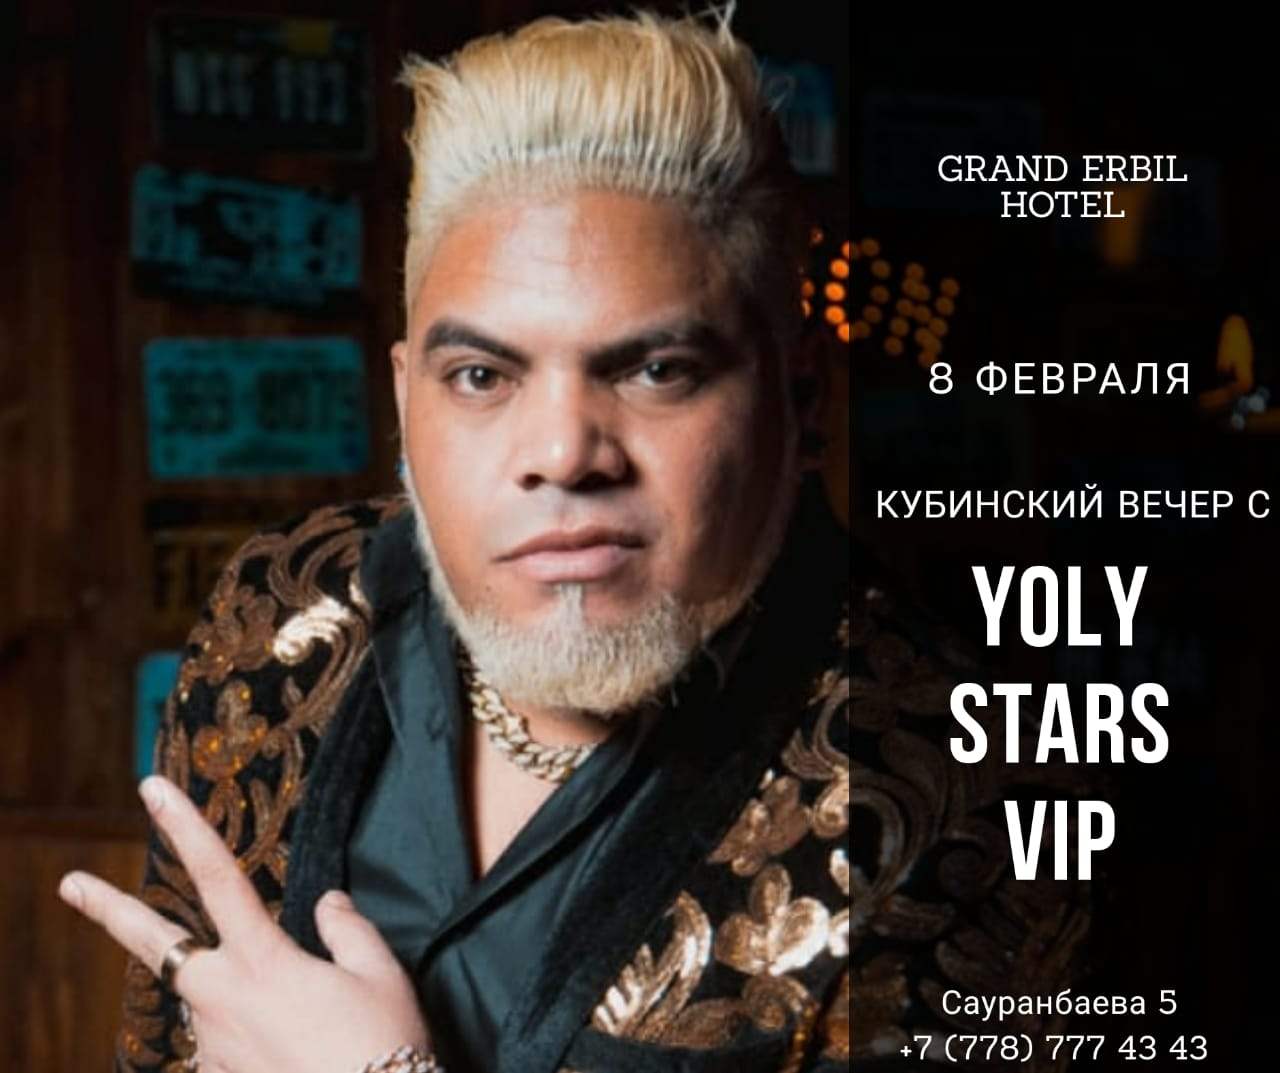 Кубинский вечер с YOLY STARS VIP 8 февраля